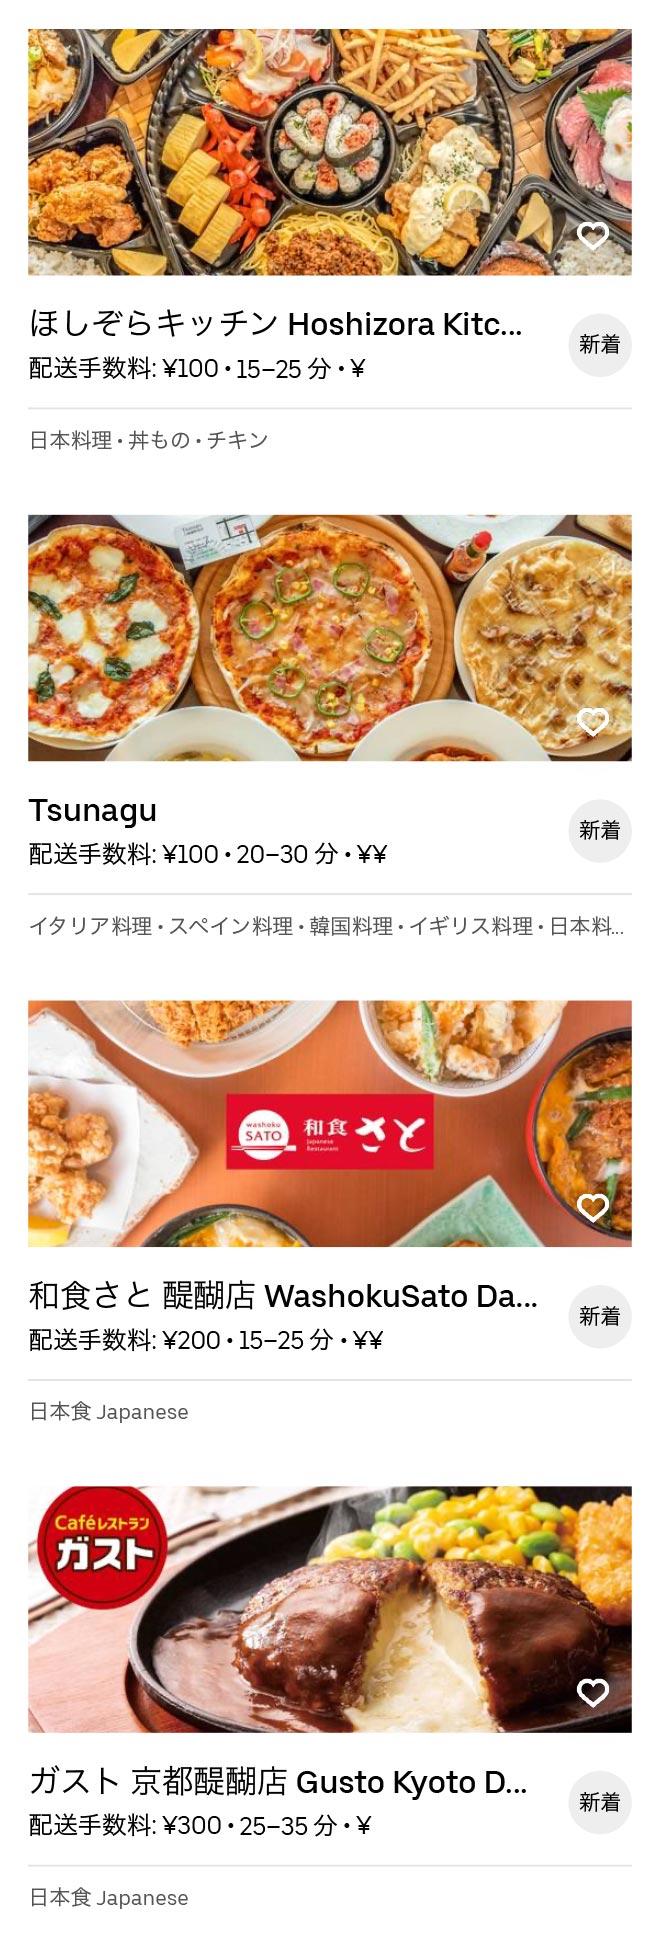 Uji rokujizo menu 2005 02